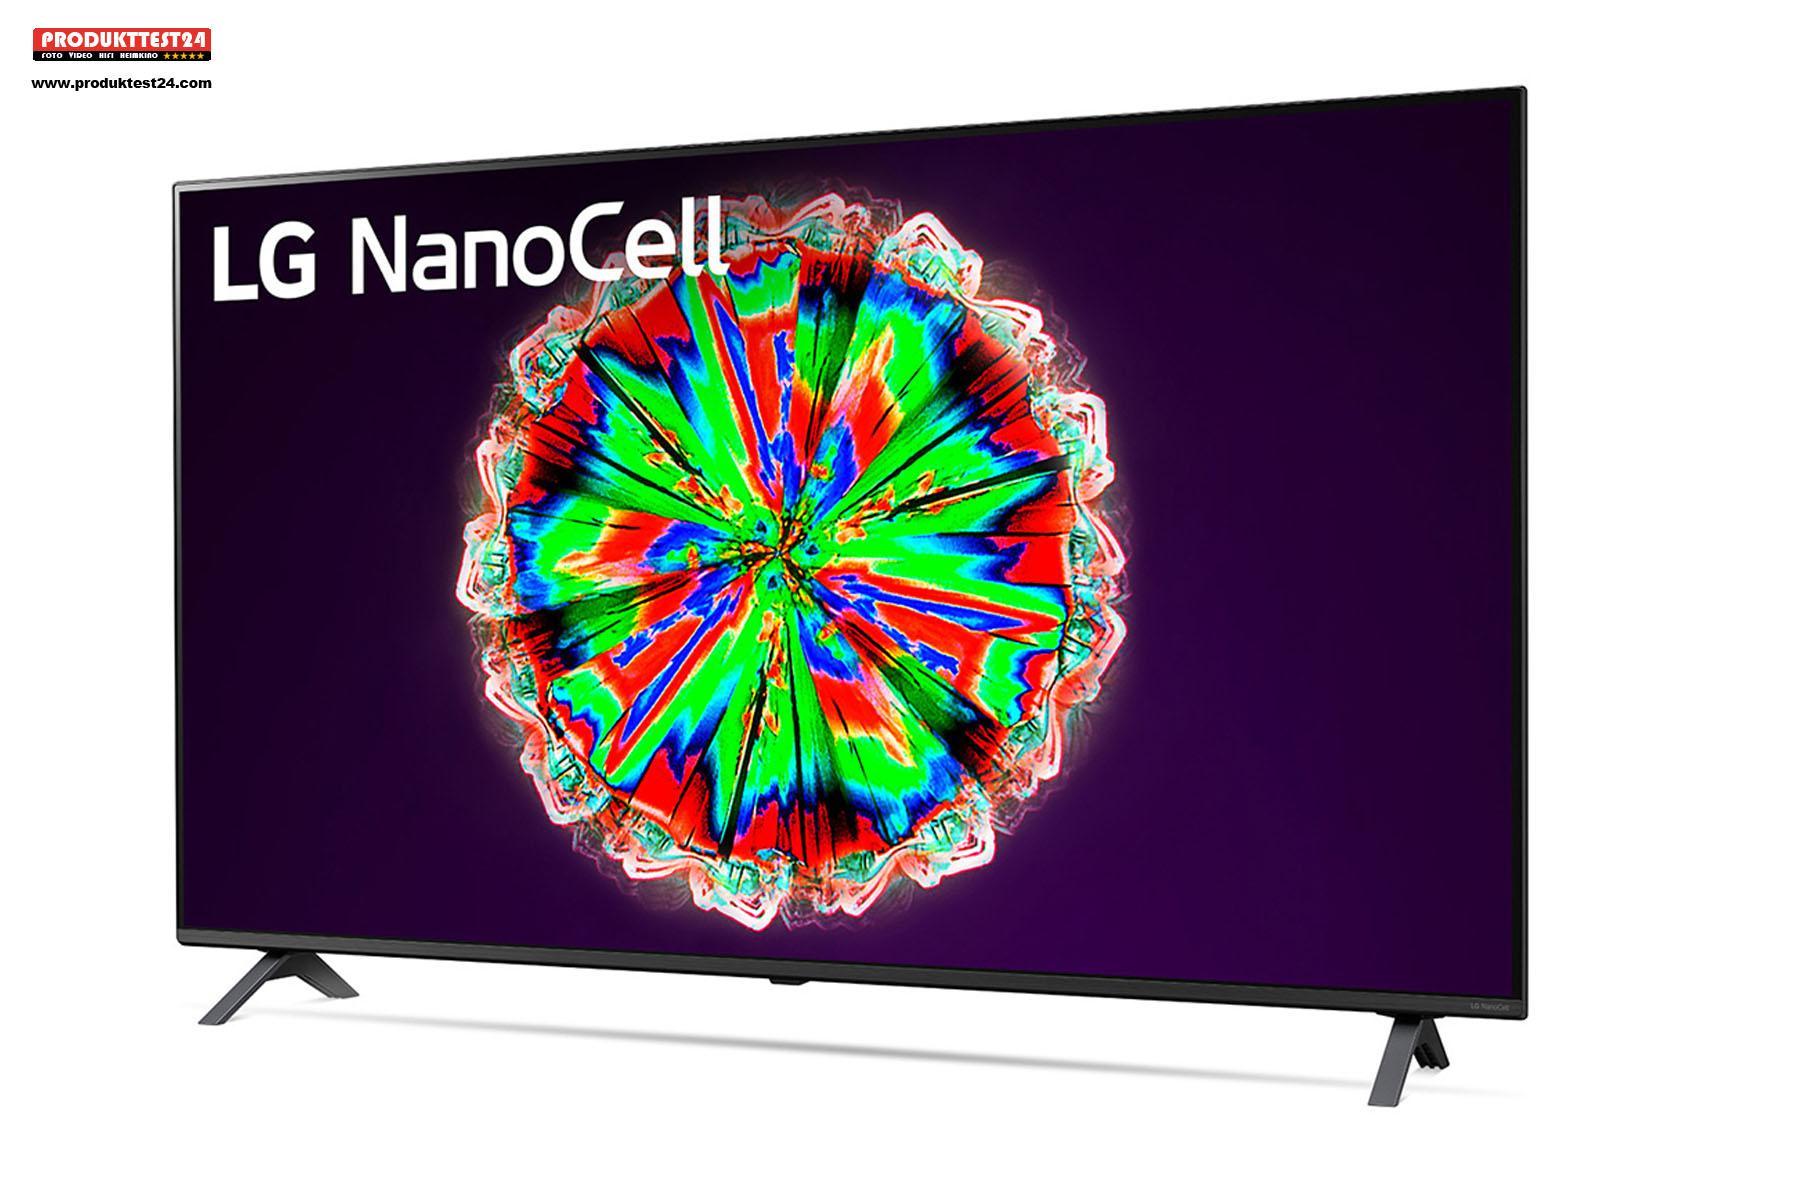 LG 49NANO806NA mit einem 49 Zoll großen NanoCell 4K-Display